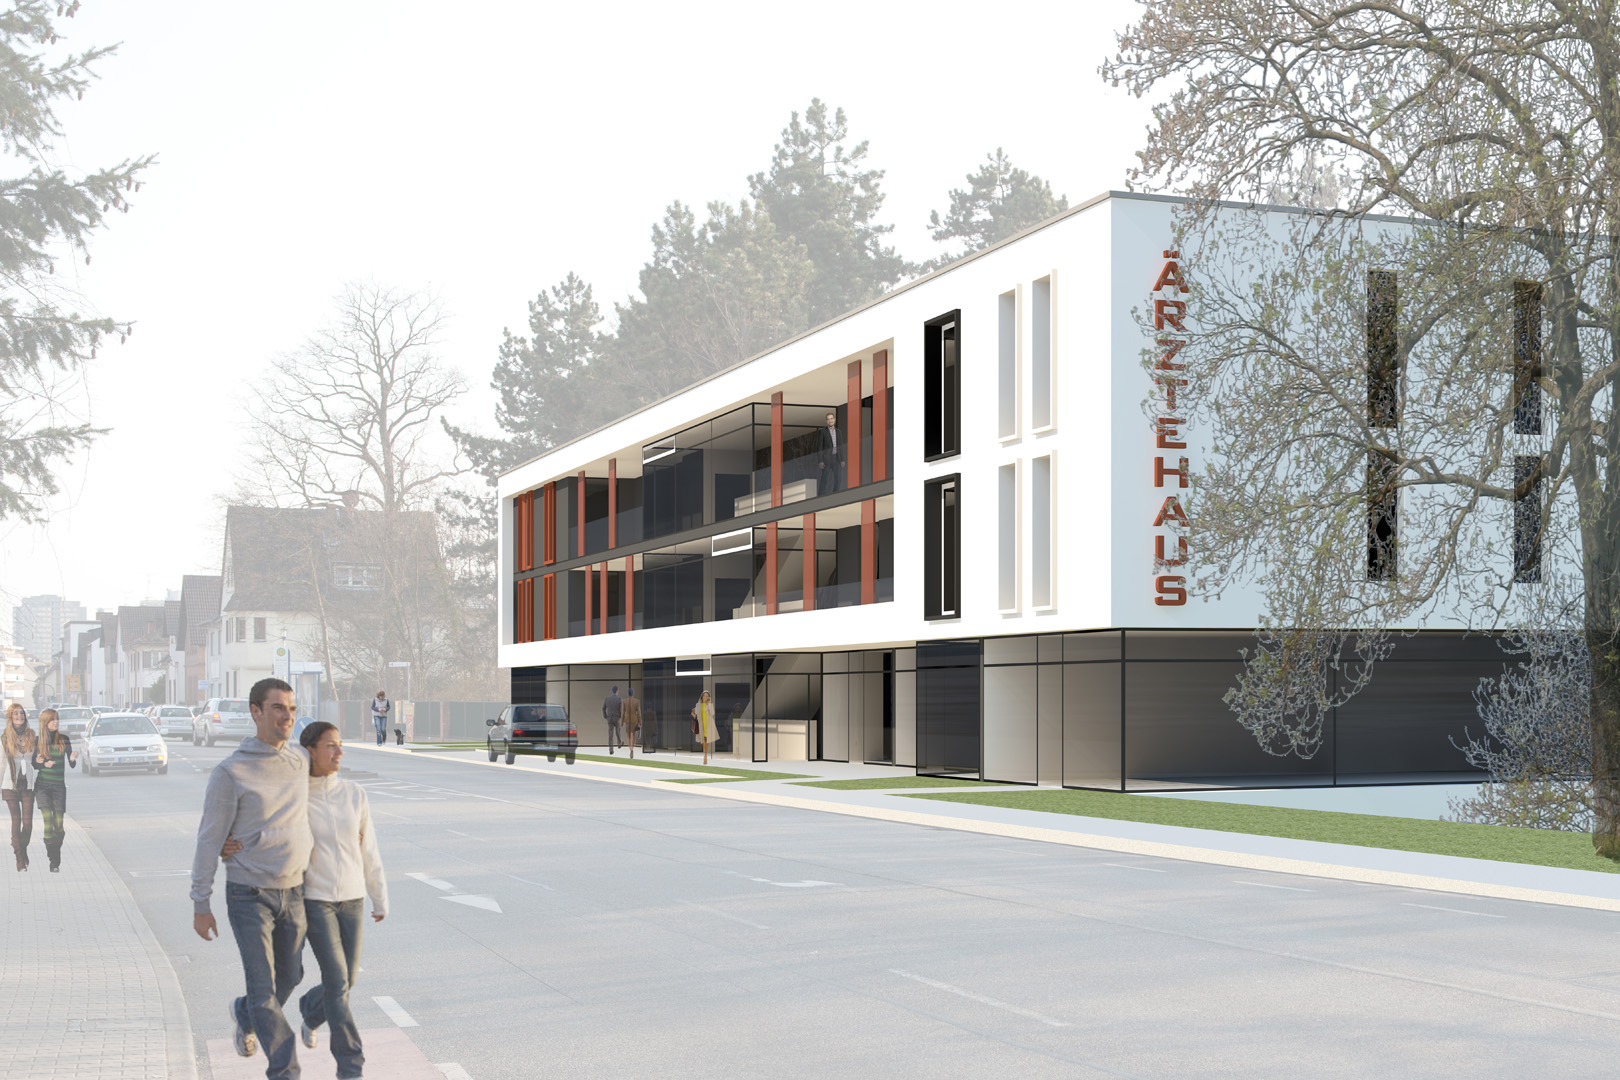 Ärztehaus Langen (Hessen): Planung 2012 /  BRI ca. 26.450m³ / BGF ca. 8.810m²